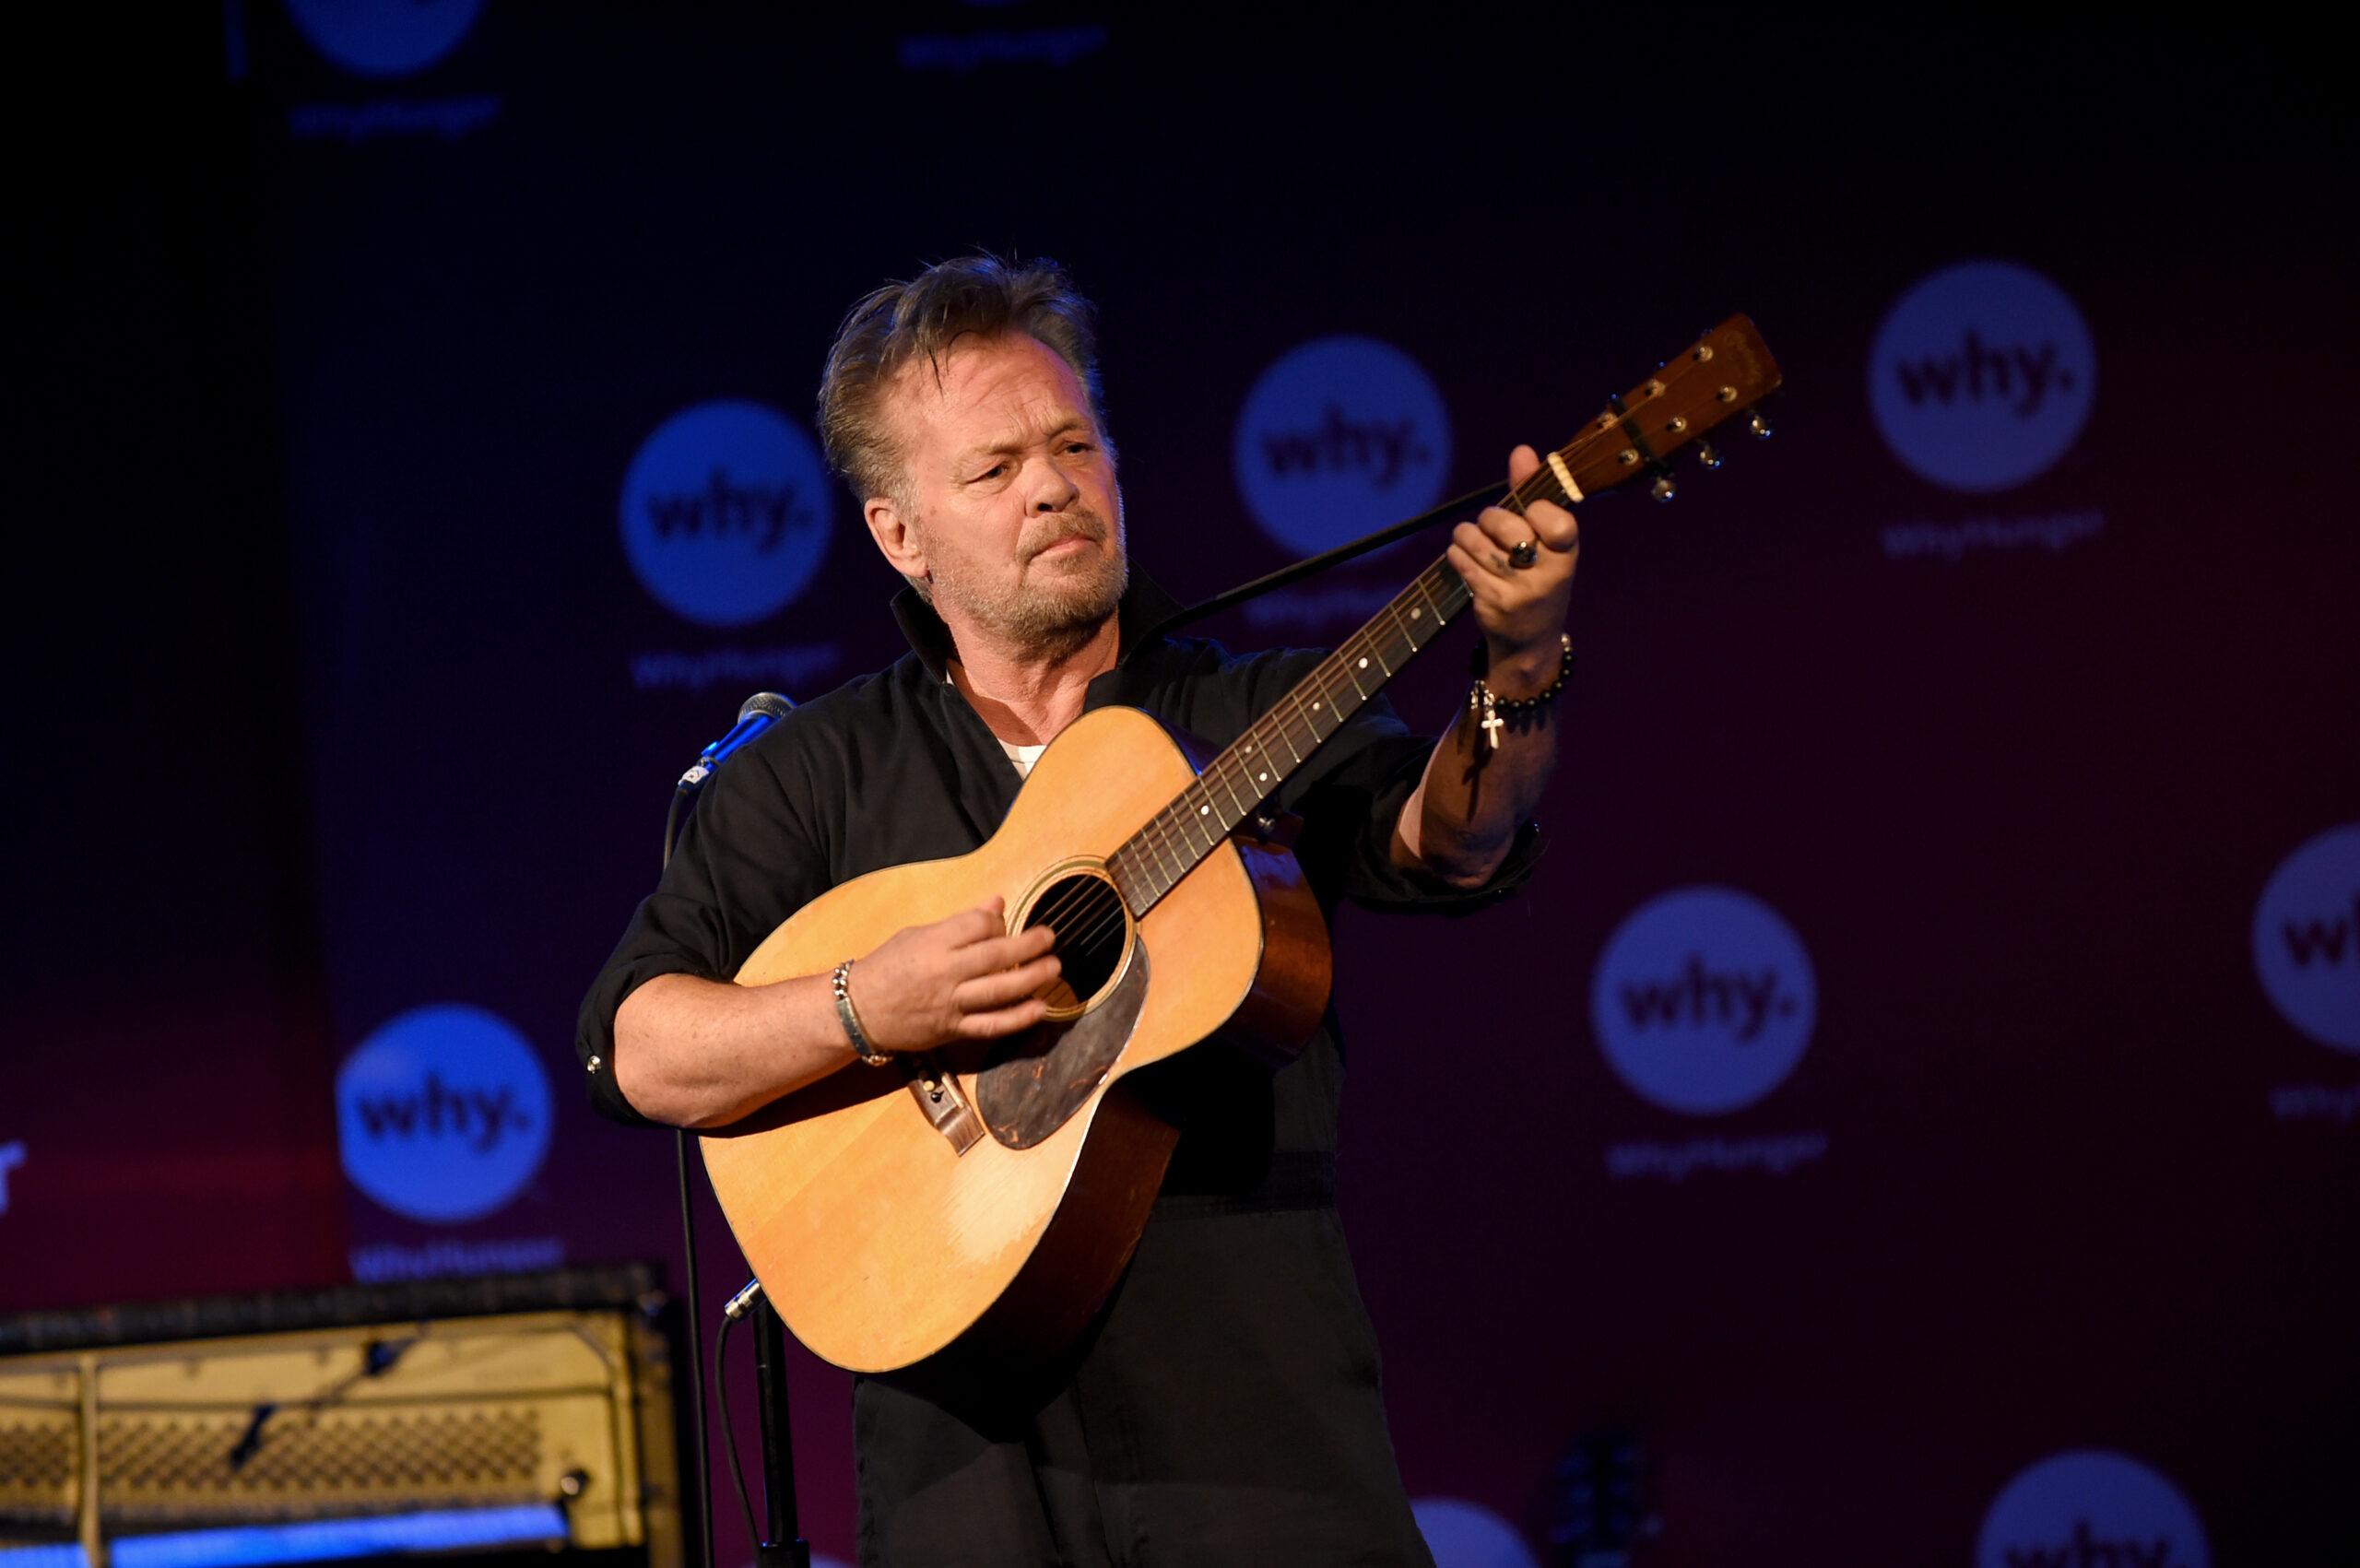 WhyHunger Salutes Musician John Mellencamp at 20th Annual Chapin Awards Gala